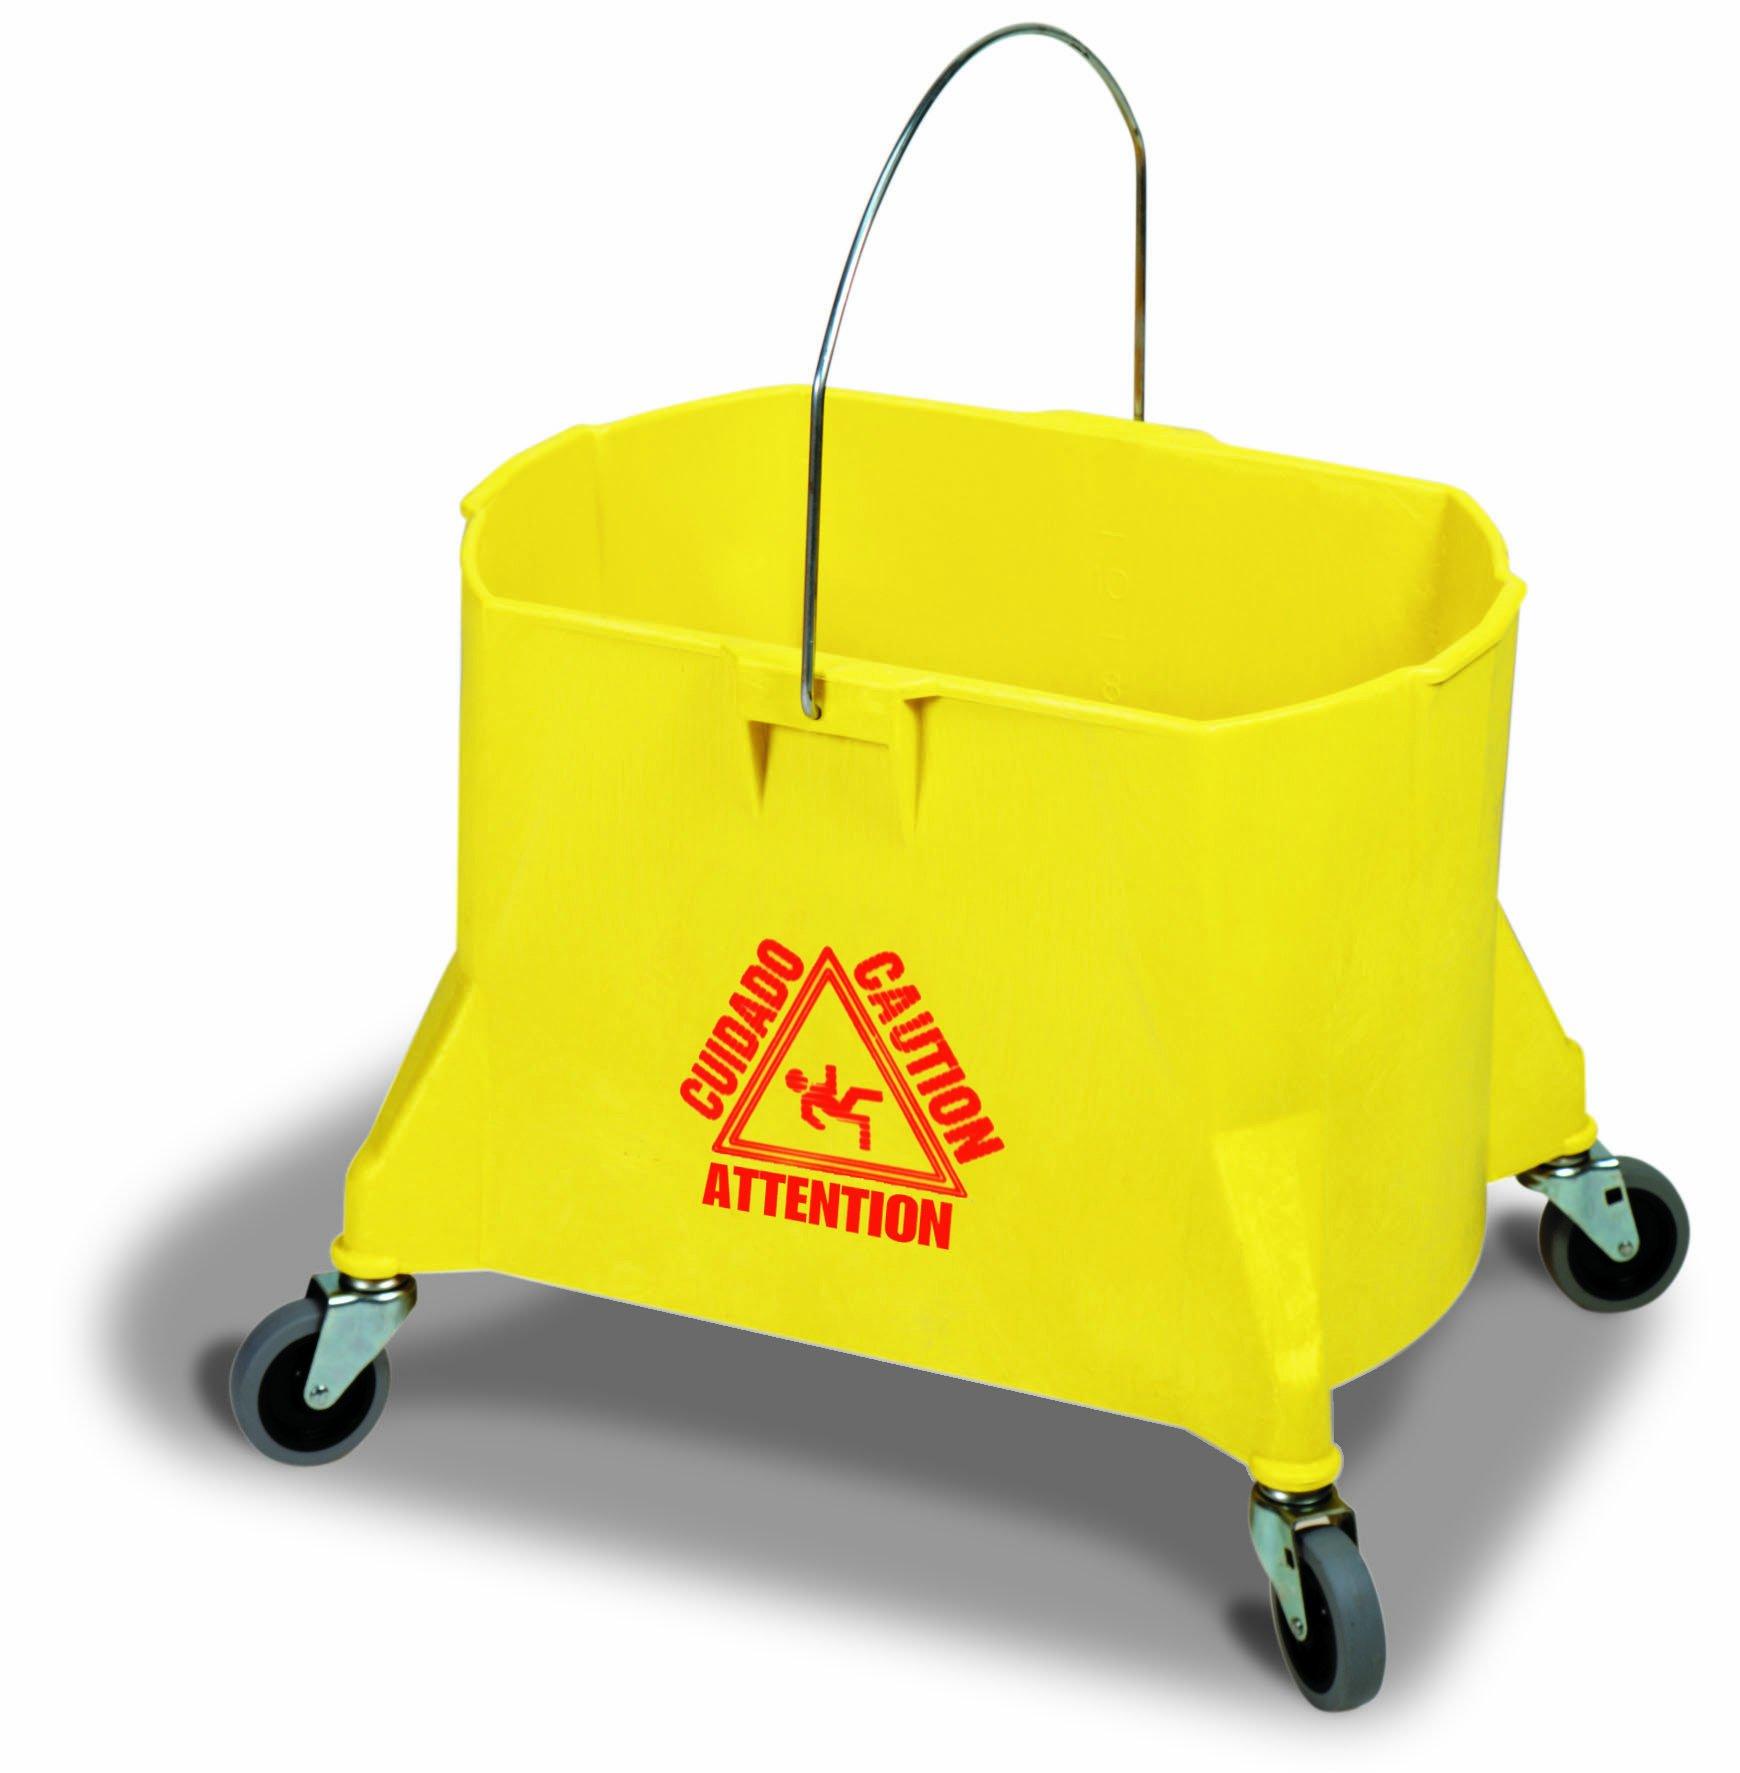 Continental 404-3YW, Yellow 44 Quart Structolene Mop Bucket (Case of 1)